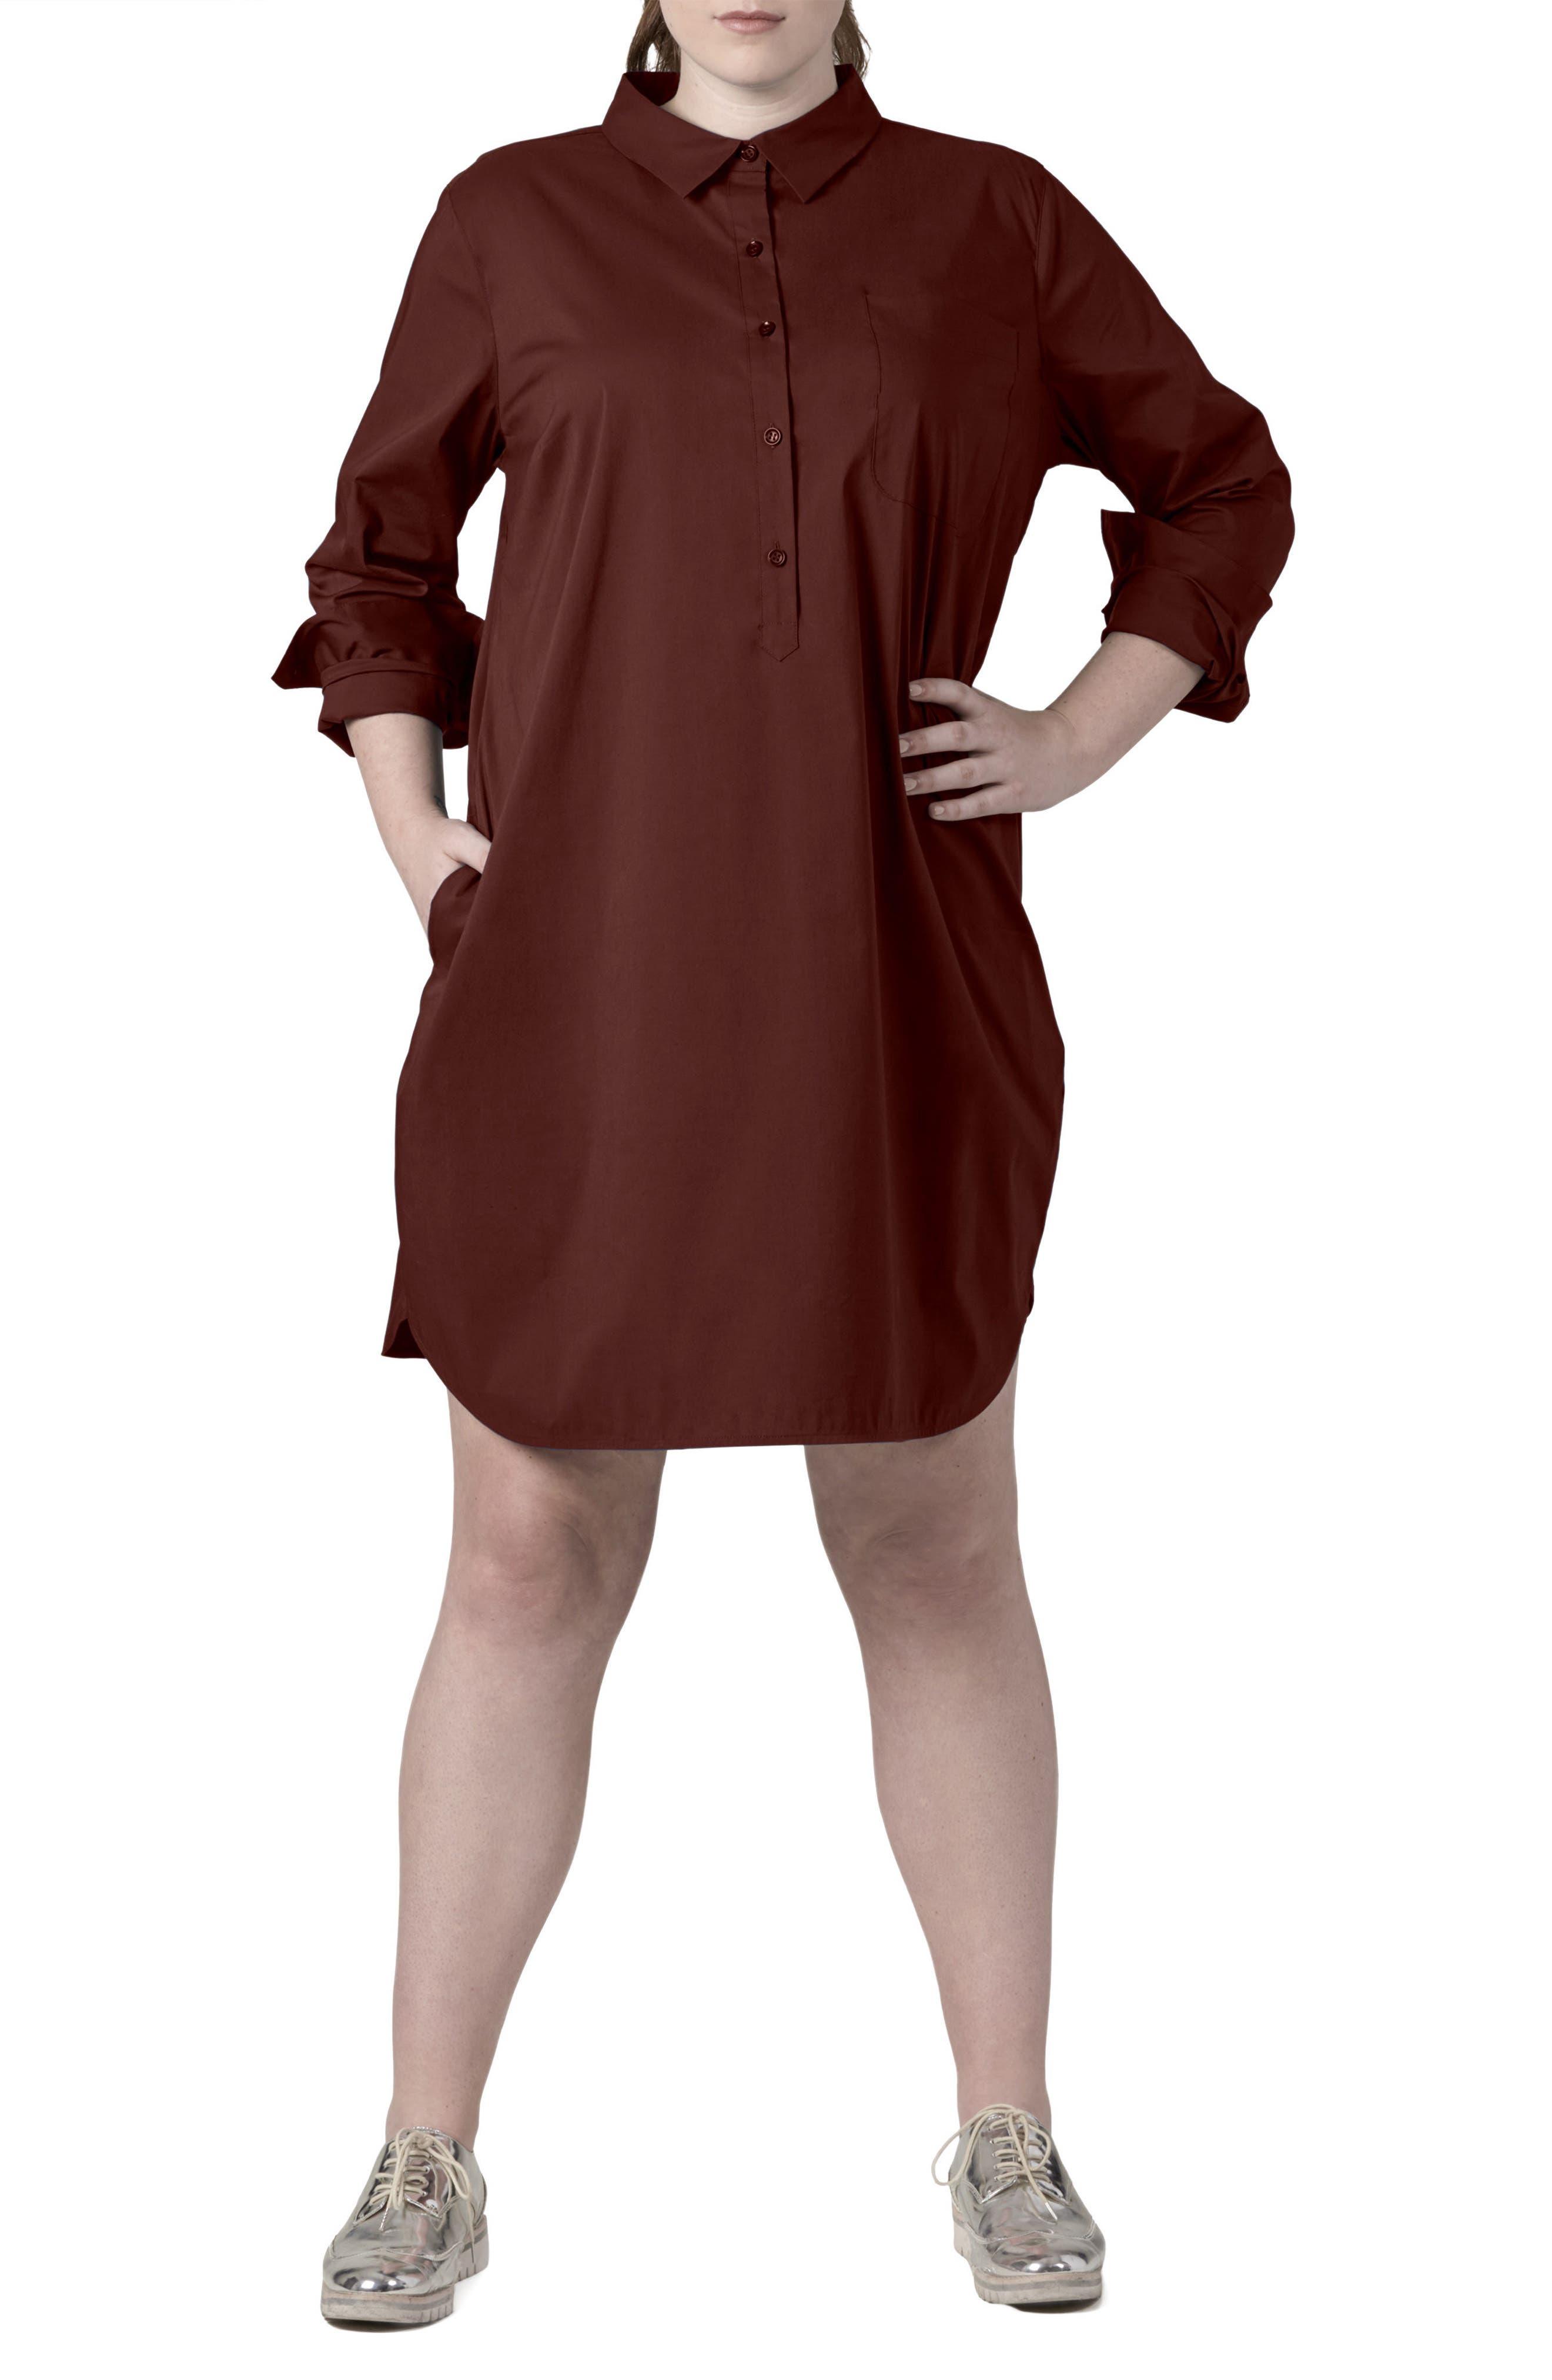 Rubicon Shirtdress,                         Main,                         color, Rum Raisin